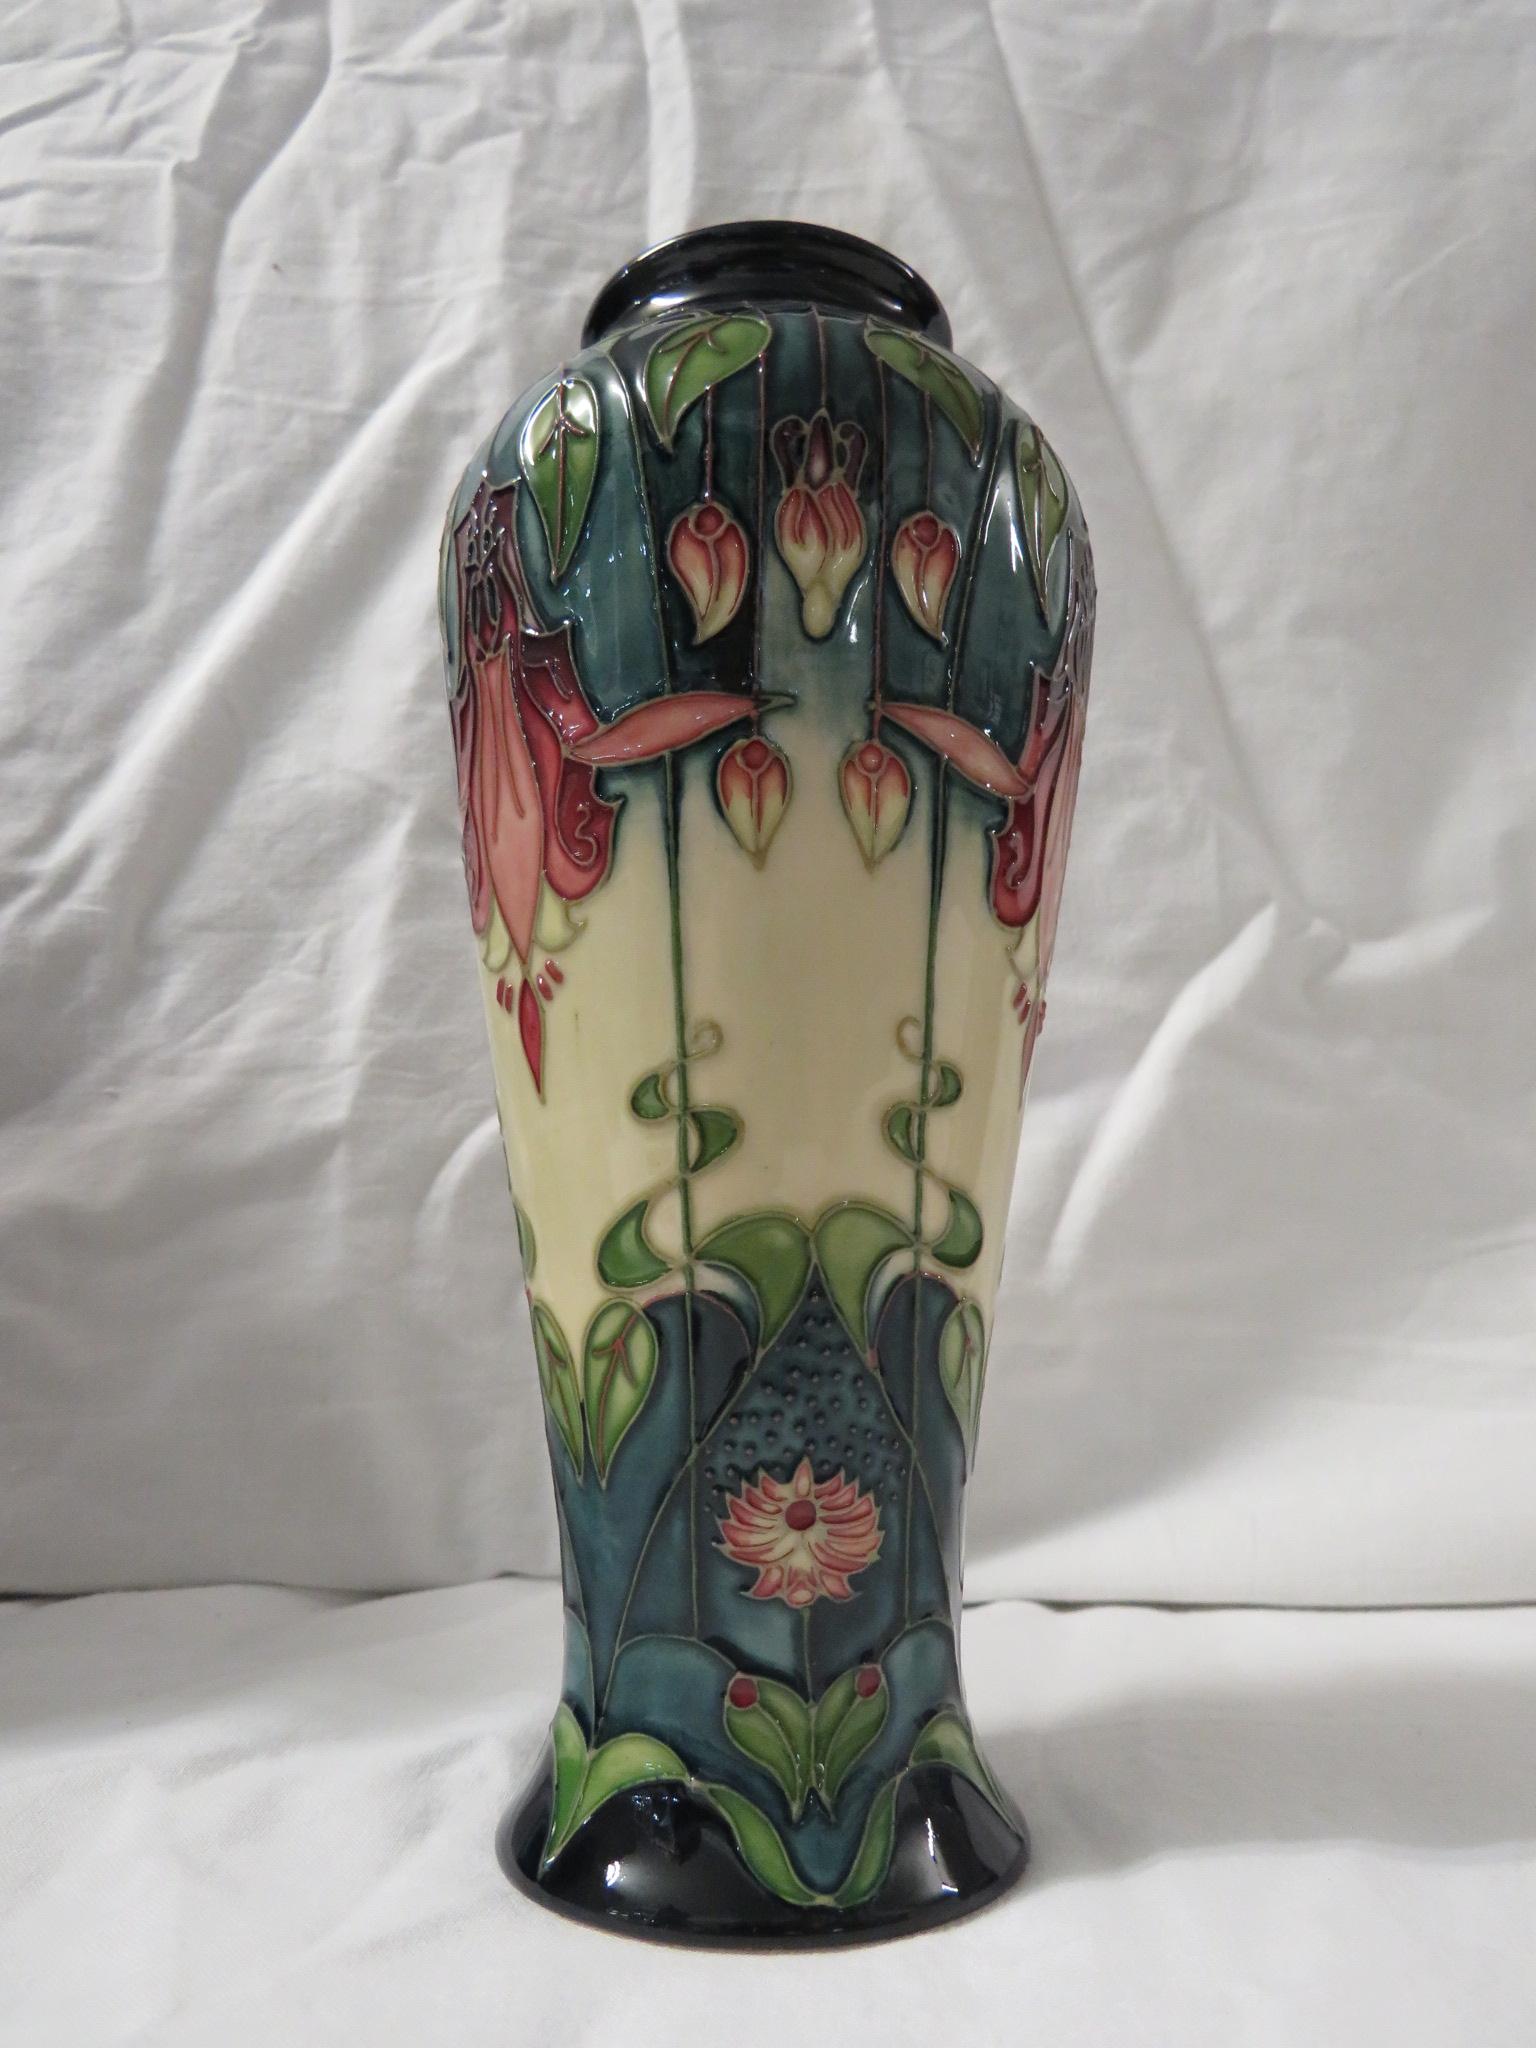 Lot 15 - Moorcroft pottery vase designed by Rachel Bishop, high shouldered baluster form, cream and graduated